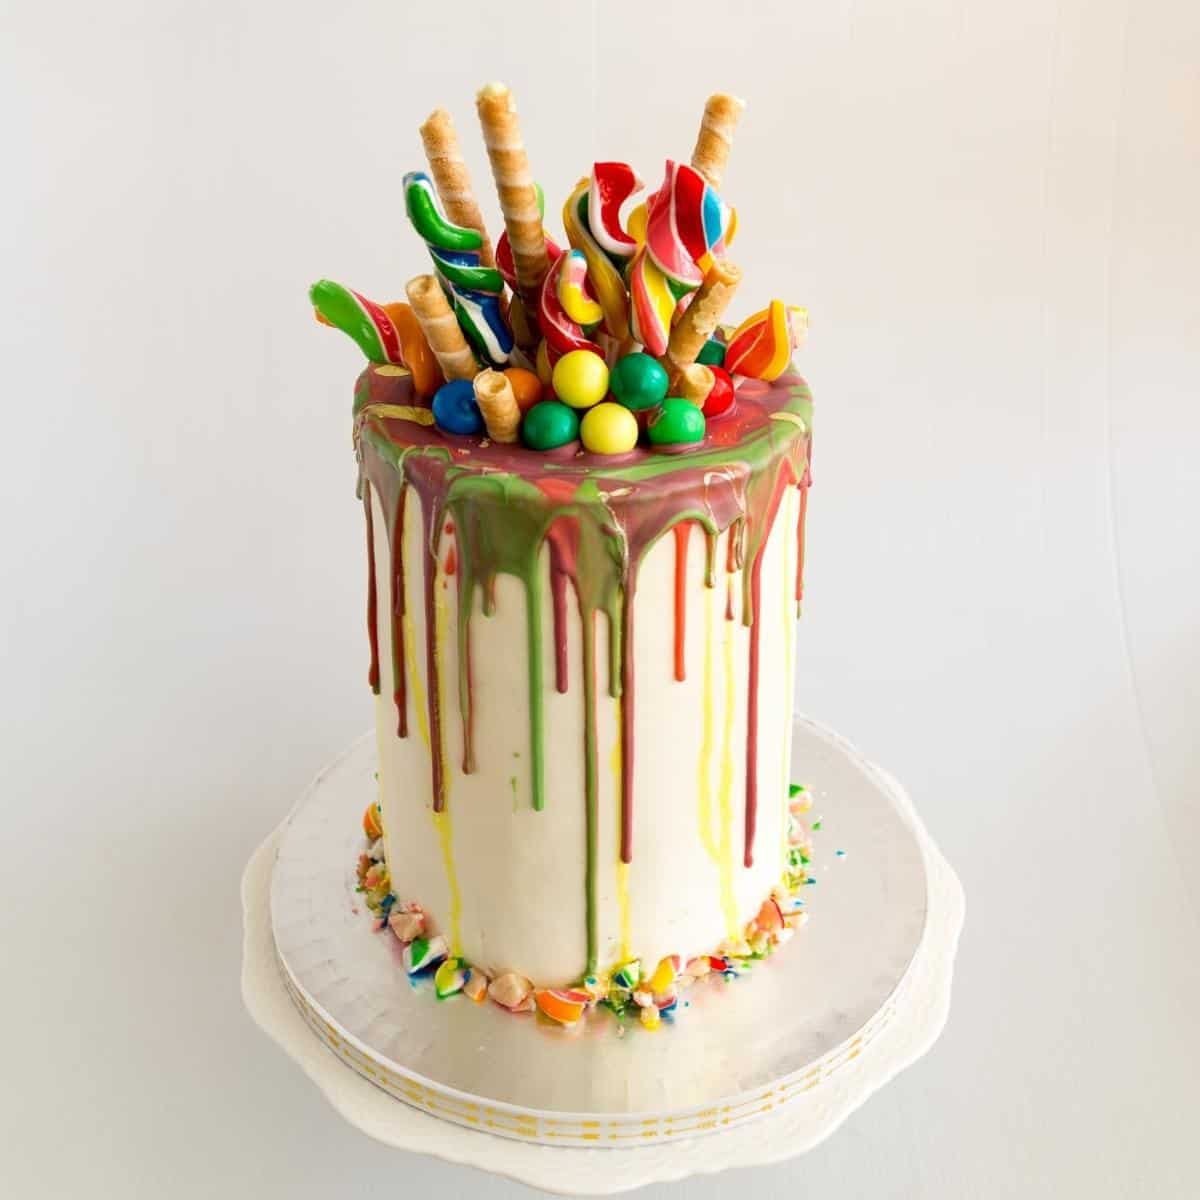 Rainbow cake on a cake stand